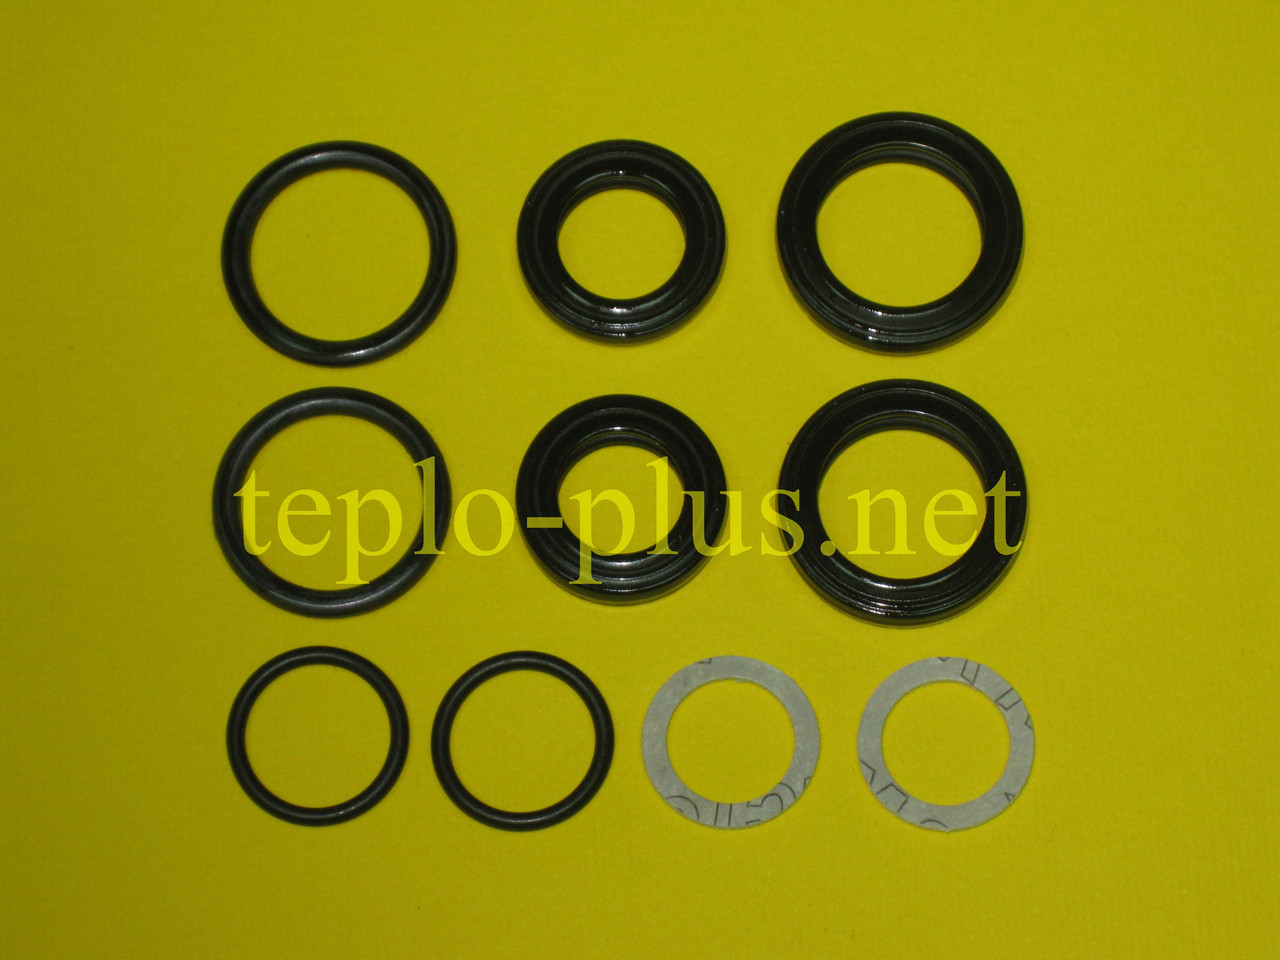 Прокладка 981142, 981163, 981151, 178969 Vaillant ATMOmax, TURBOmax Pro / Plus, atmoTEC Pro / turboTEC Pro, фото 1